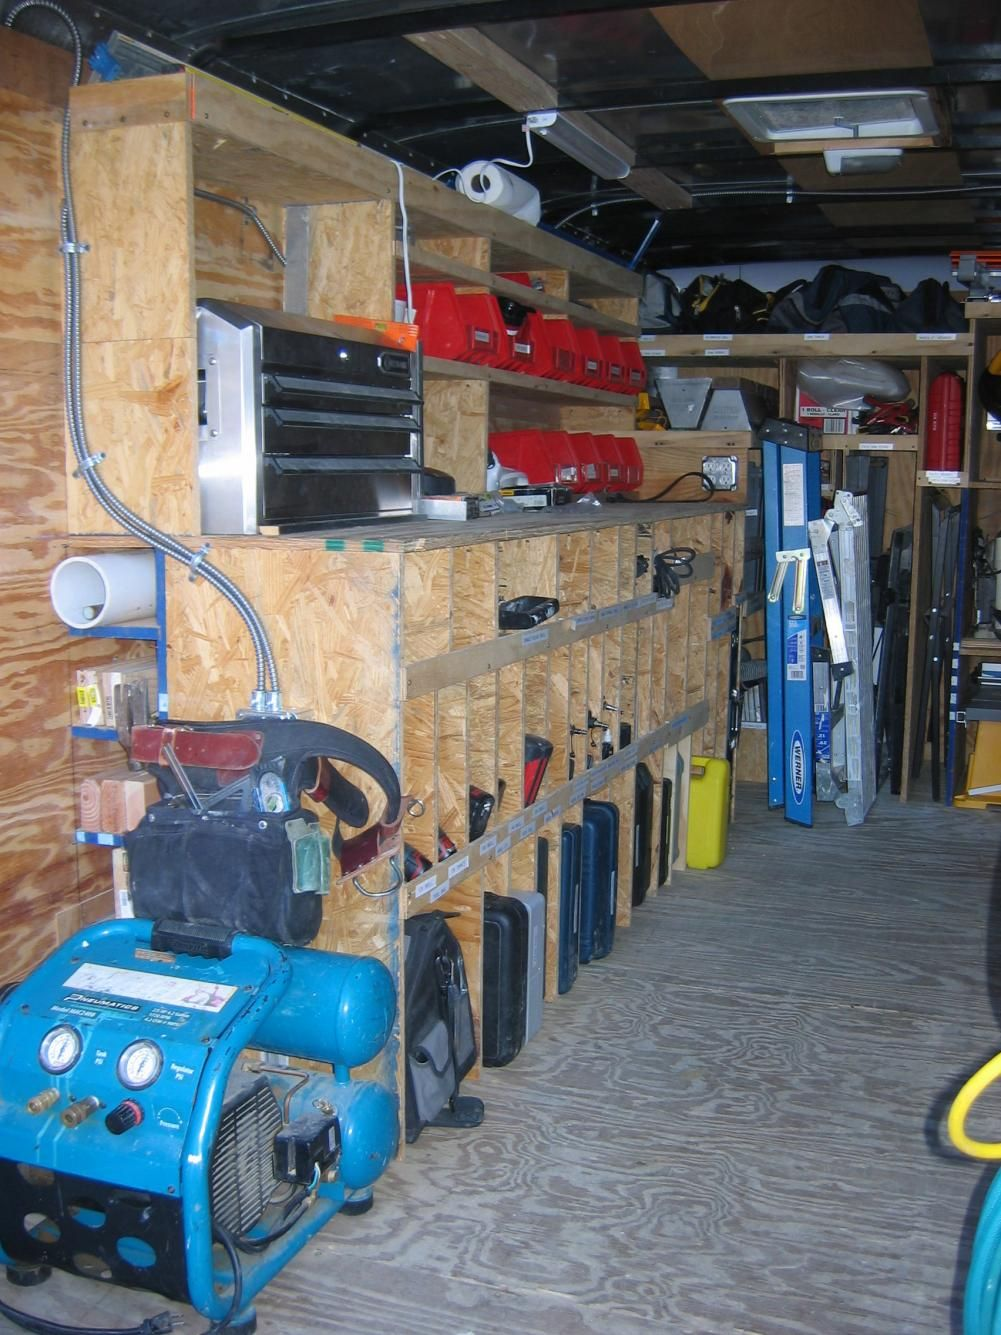 Pin By Micheal On Handyman Cargo Van Storage Ideas In 2019